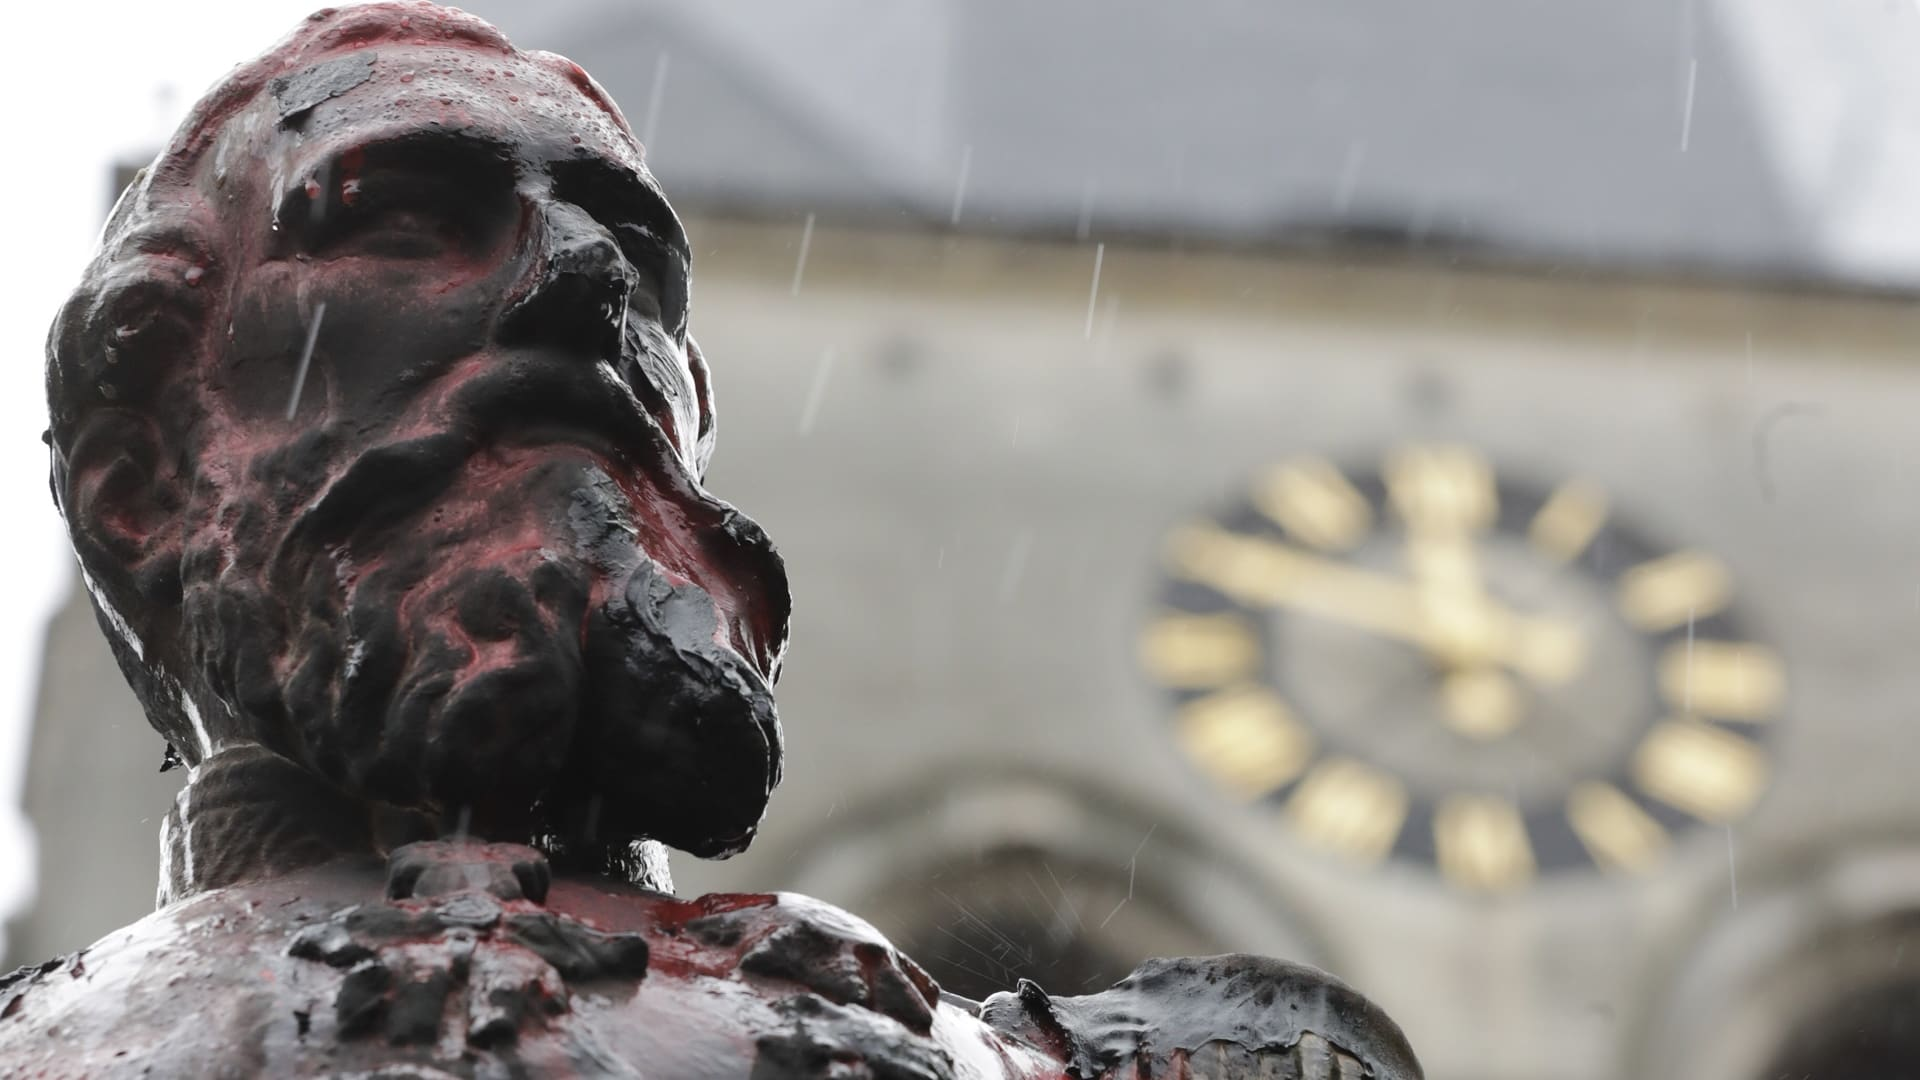 kuningas Leopold II:n töhritty patsas